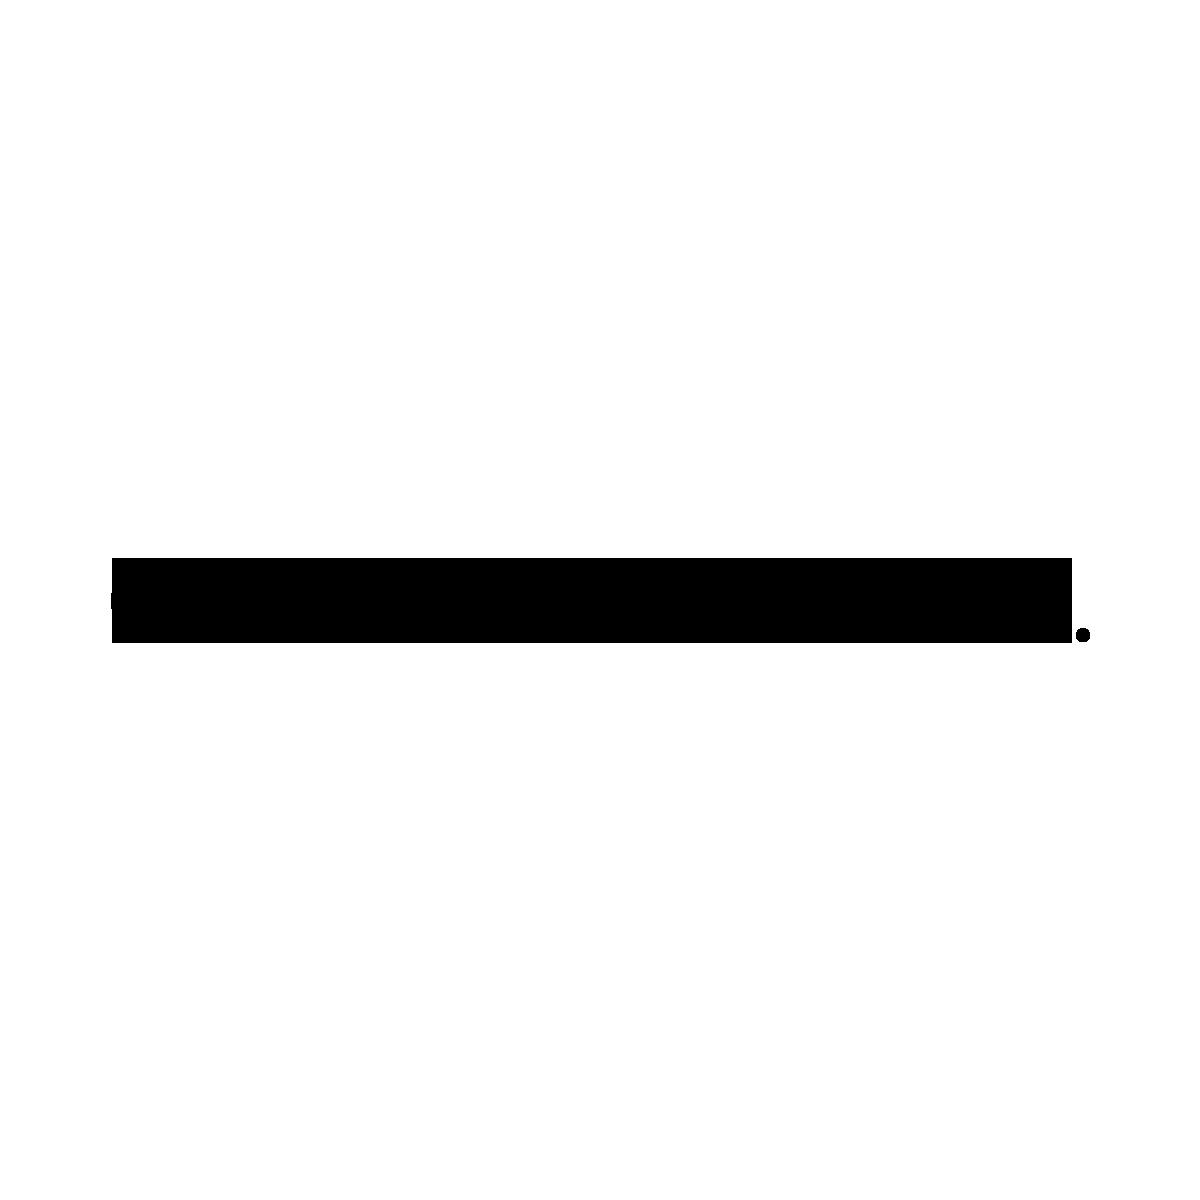 fred de la bretoniere espadrille loafer in geprint leer rood 152010003 detail hak